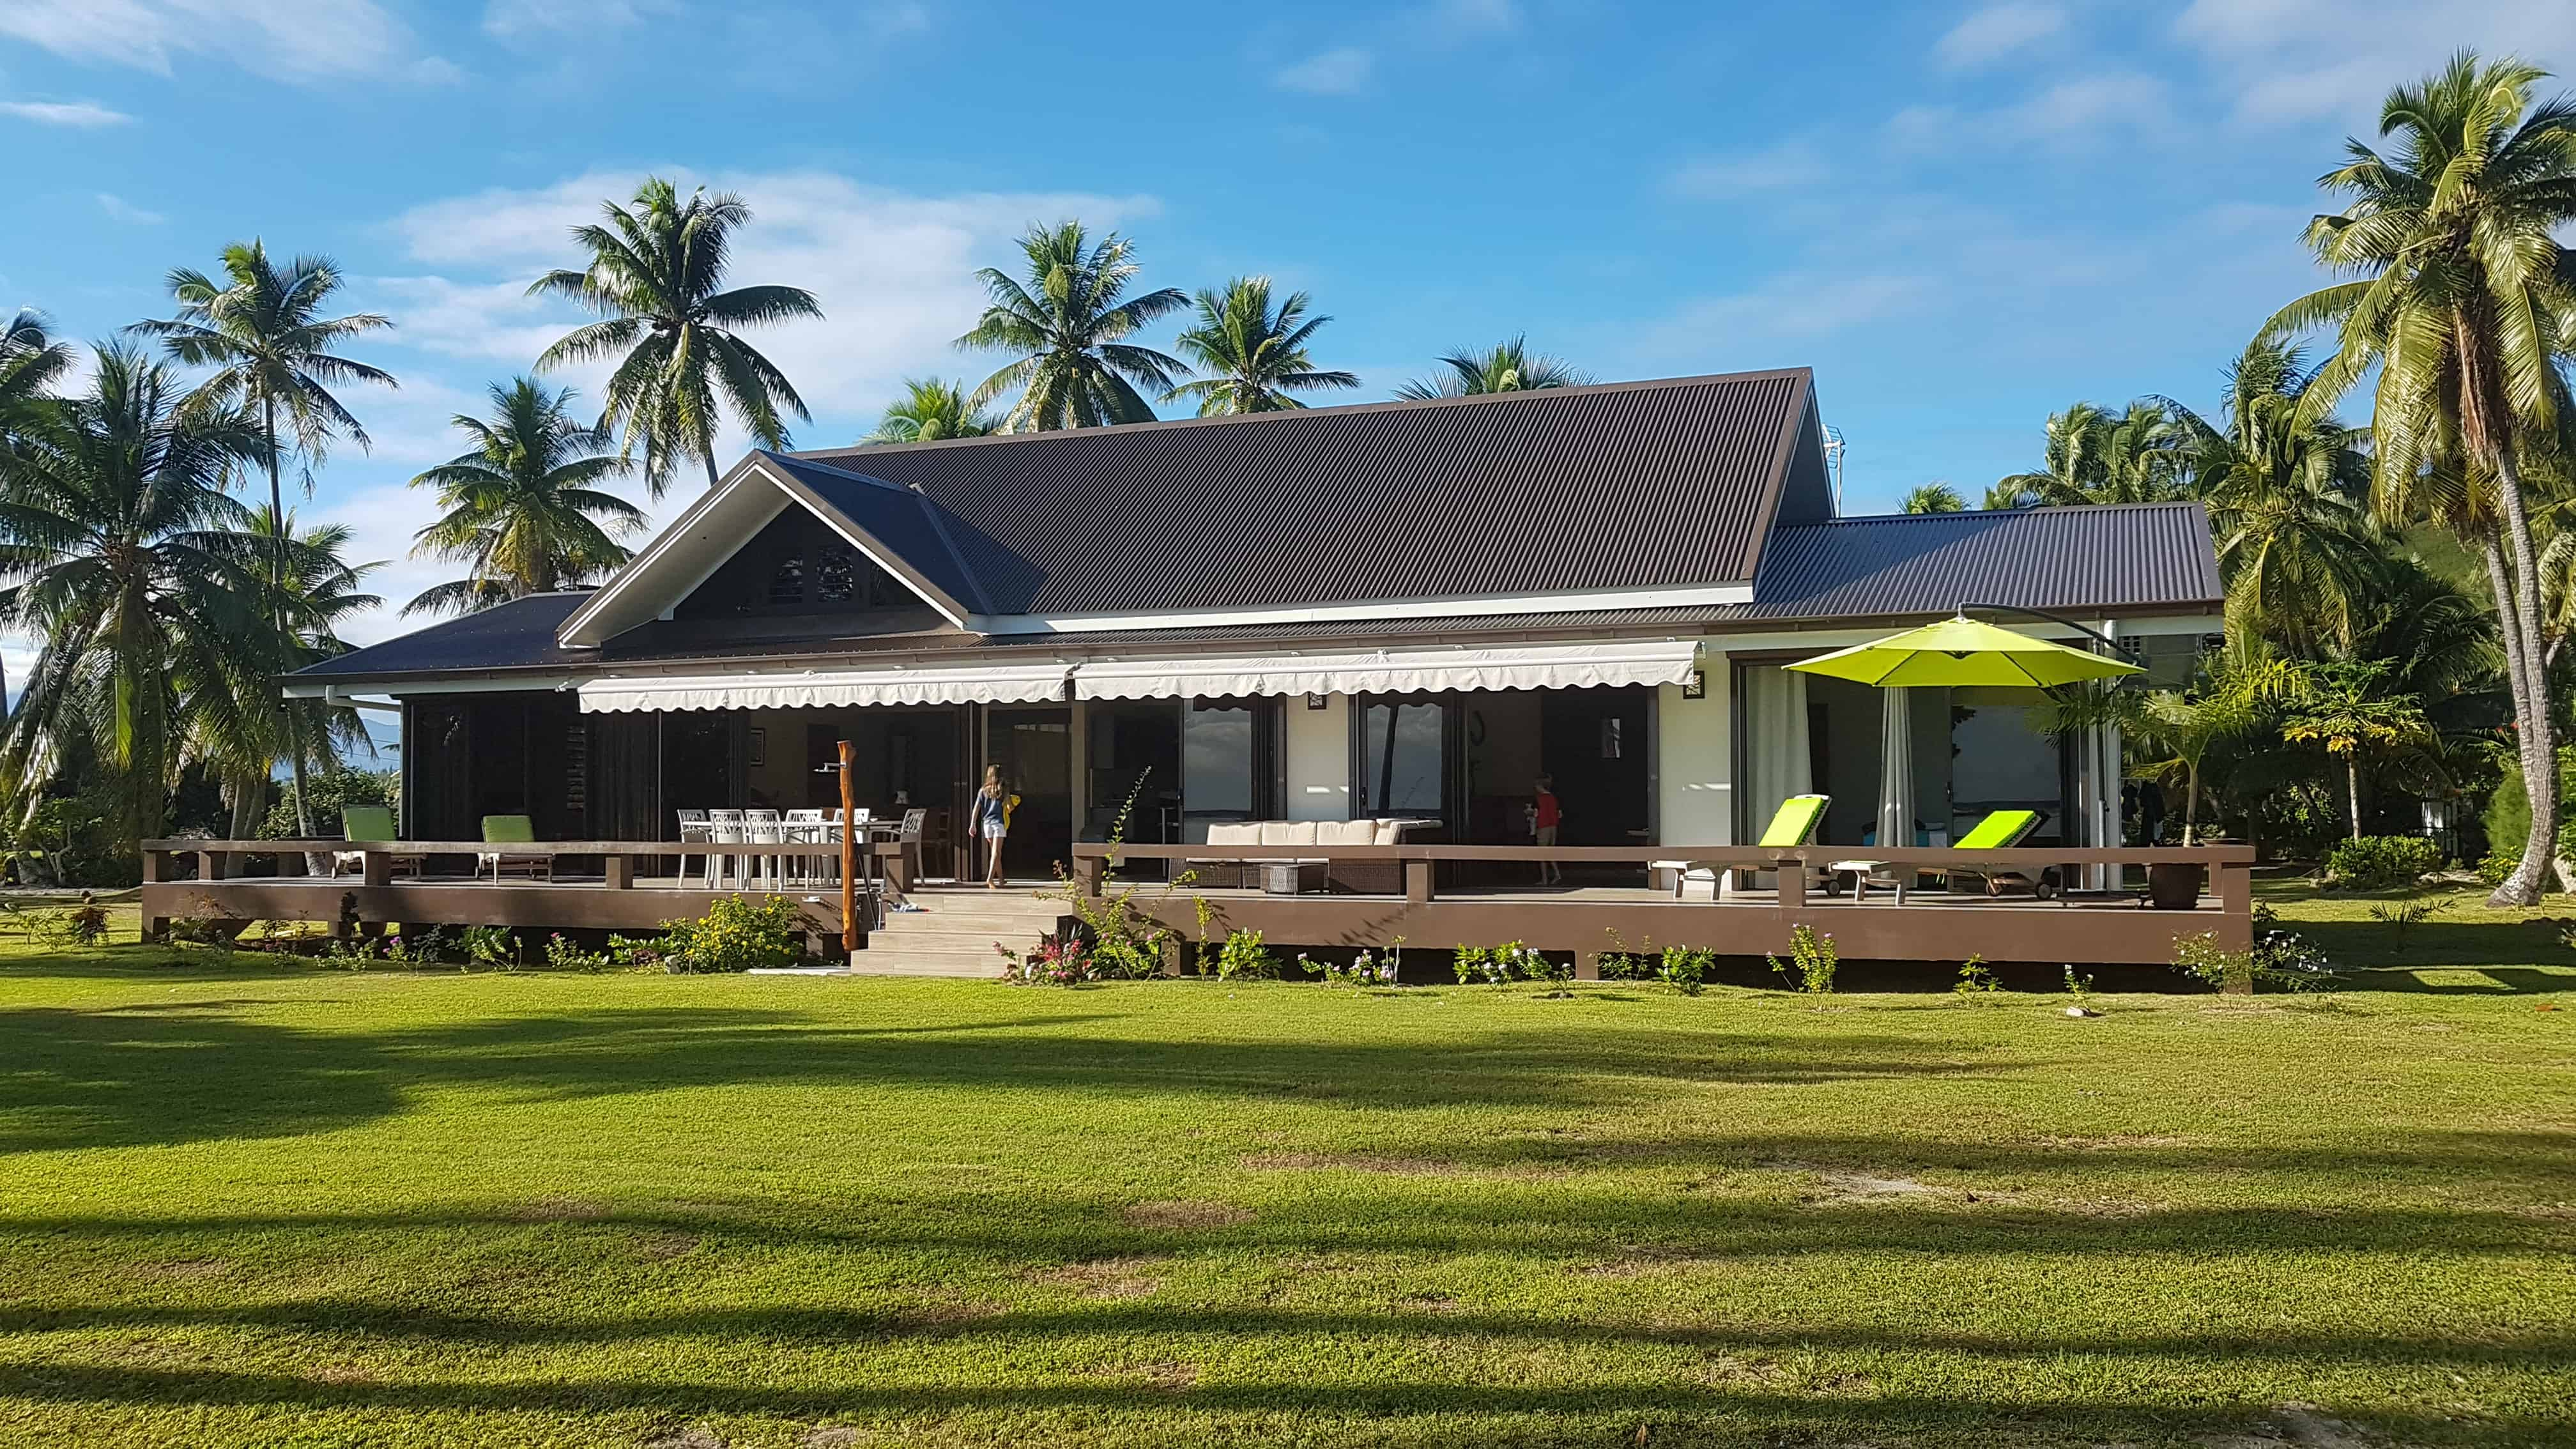 https://tahititourisme.com/wp-content/uploads/2018/09/Villa-Tiarenui-by-Tahiti-Homes-®-a-Moorea-4.jpg